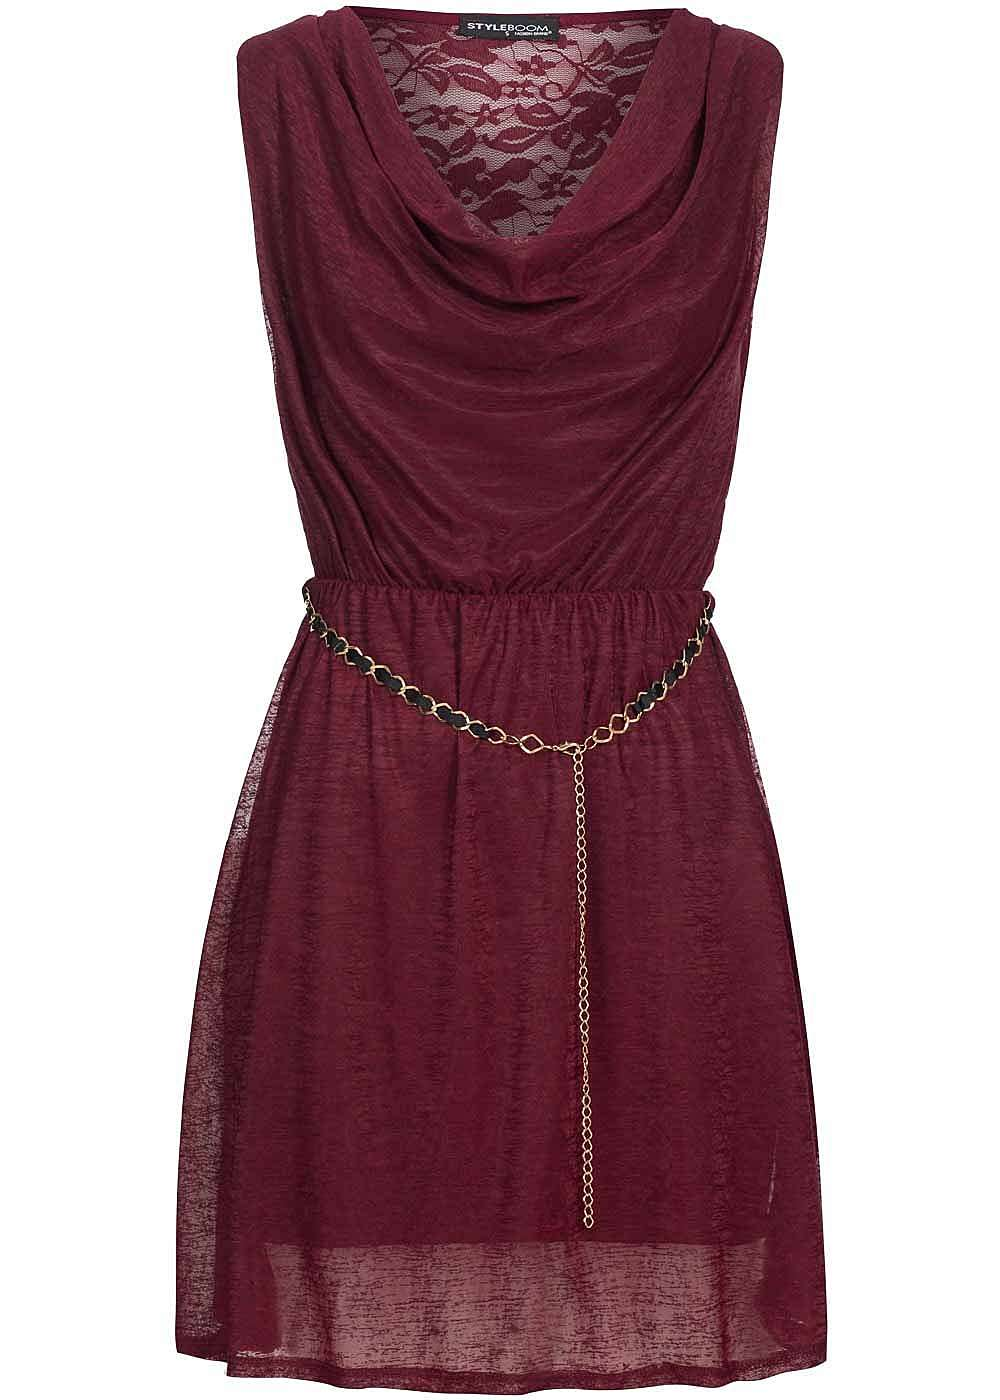 styleboom fashion damen mini wasserfall kleid gummizug mit gliederkette spitze bordeaux. Black Bedroom Furniture Sets. Home Design Ideas